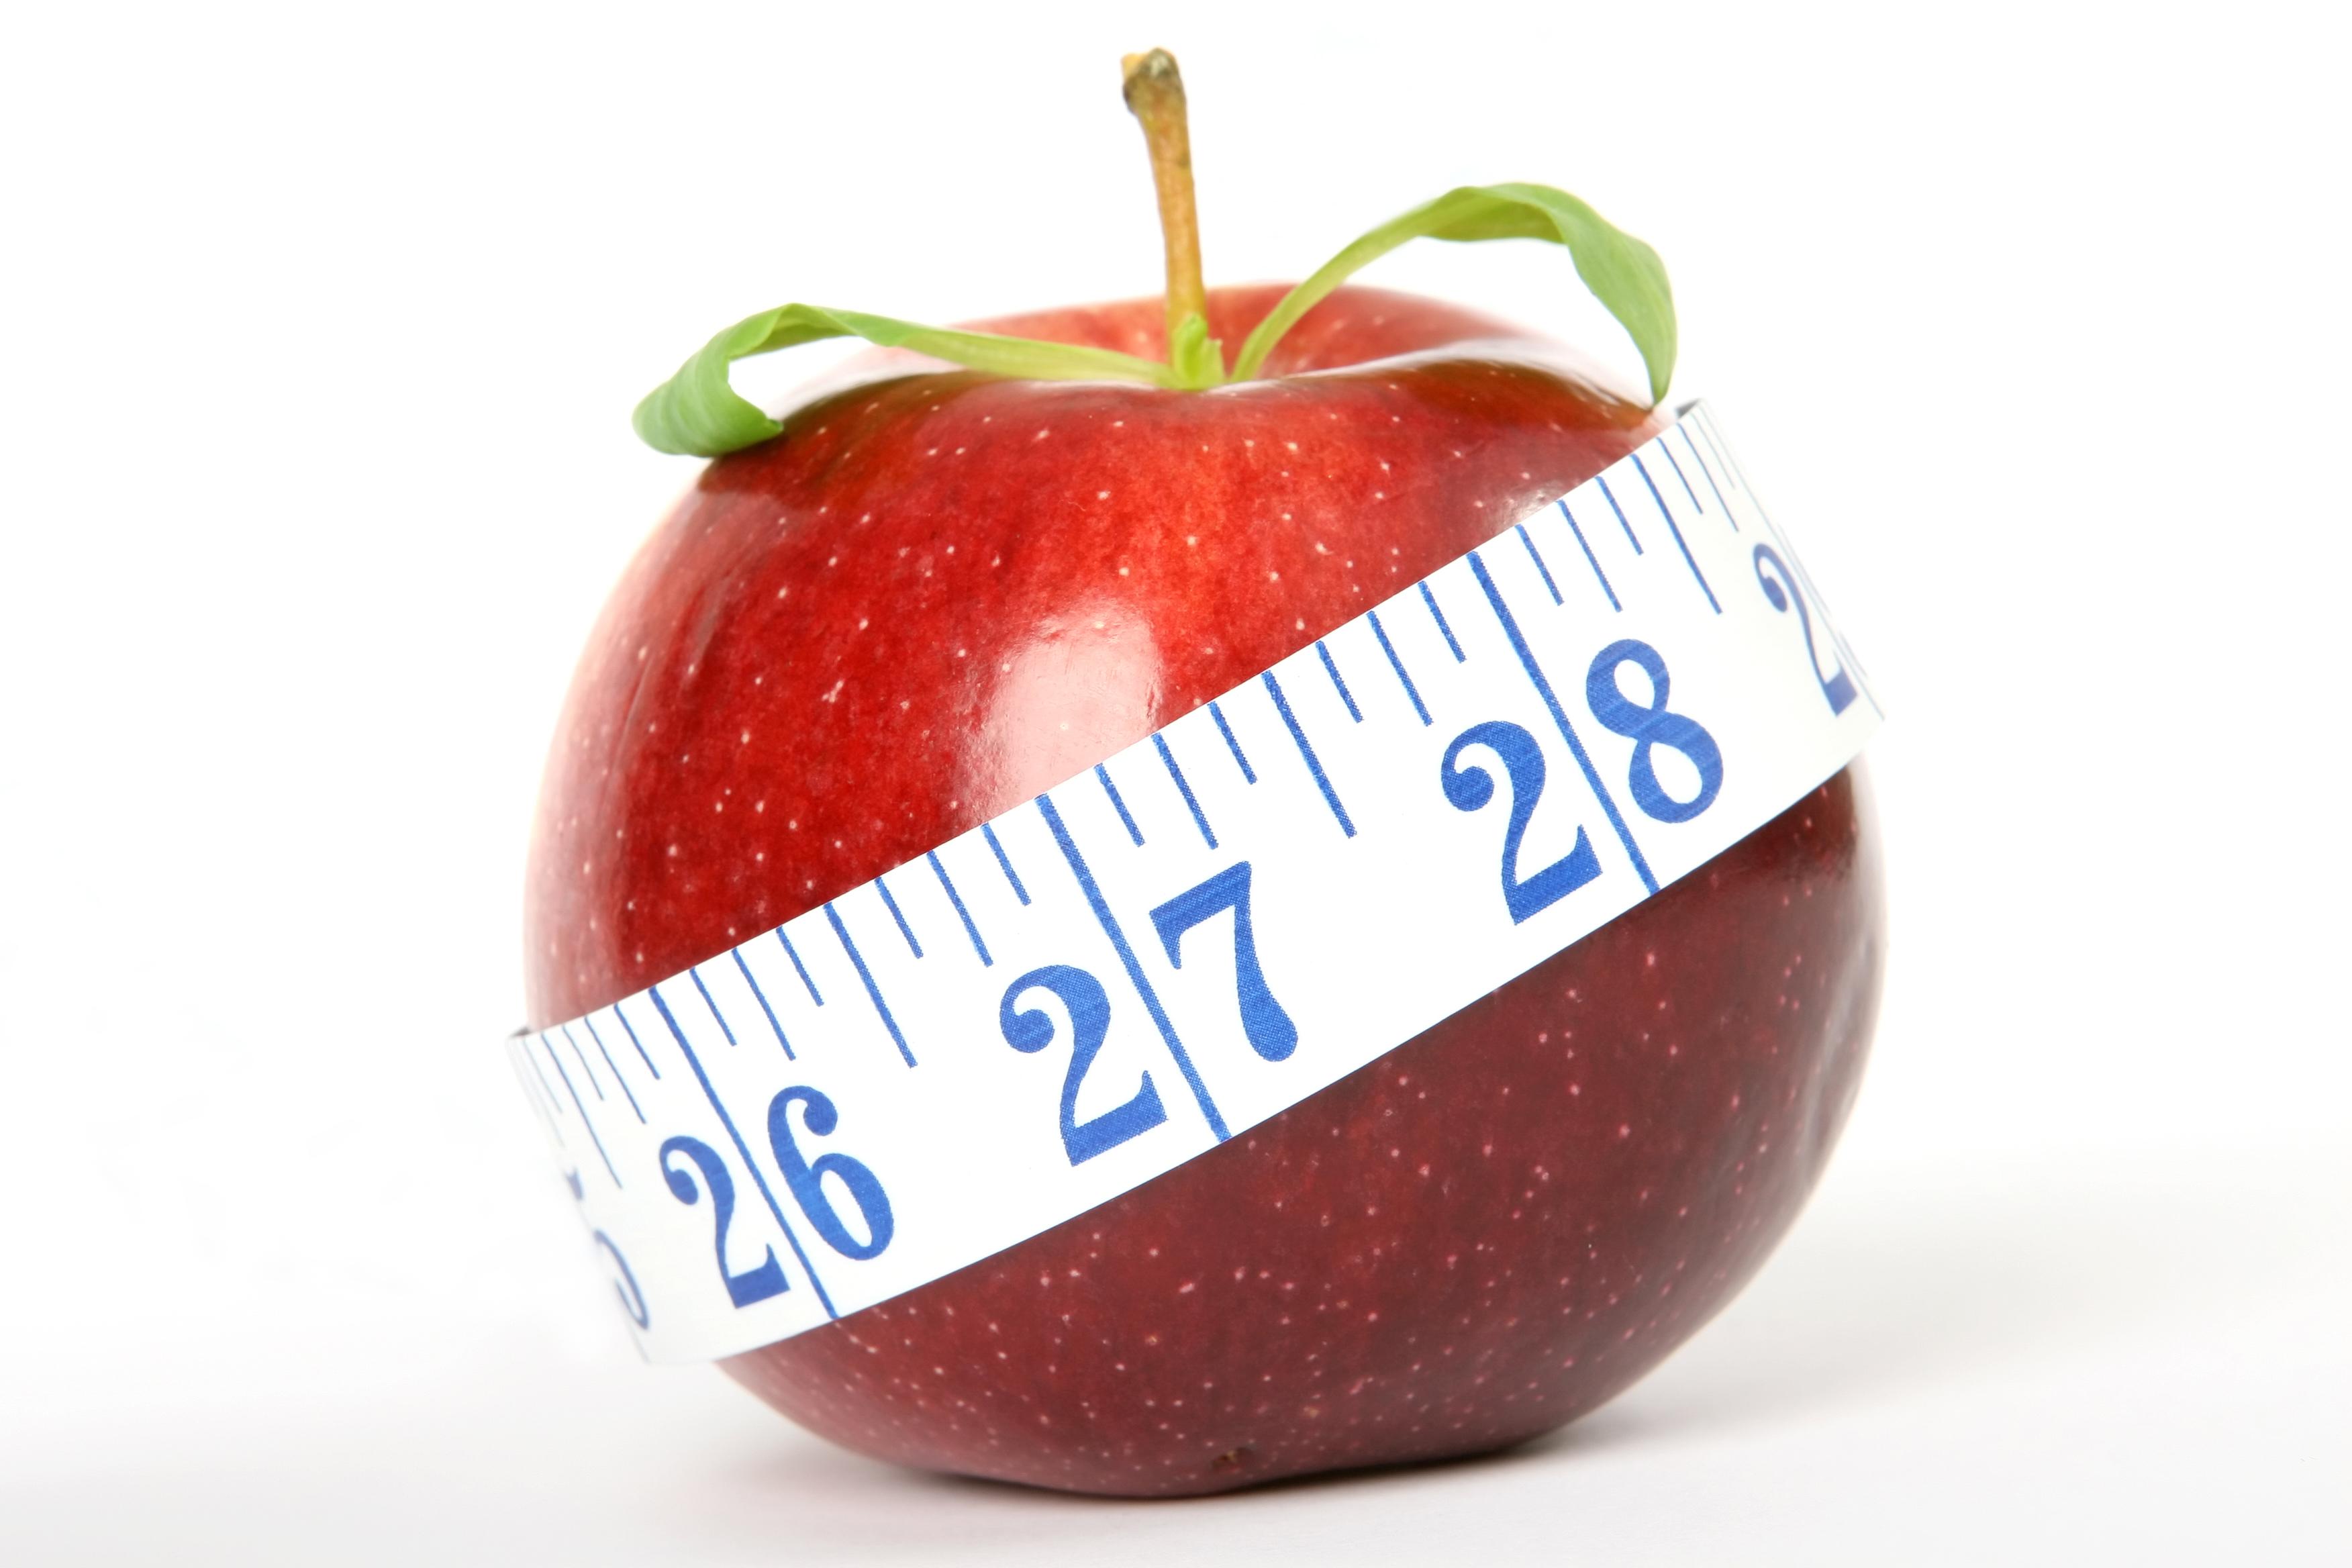 Appel op dieet